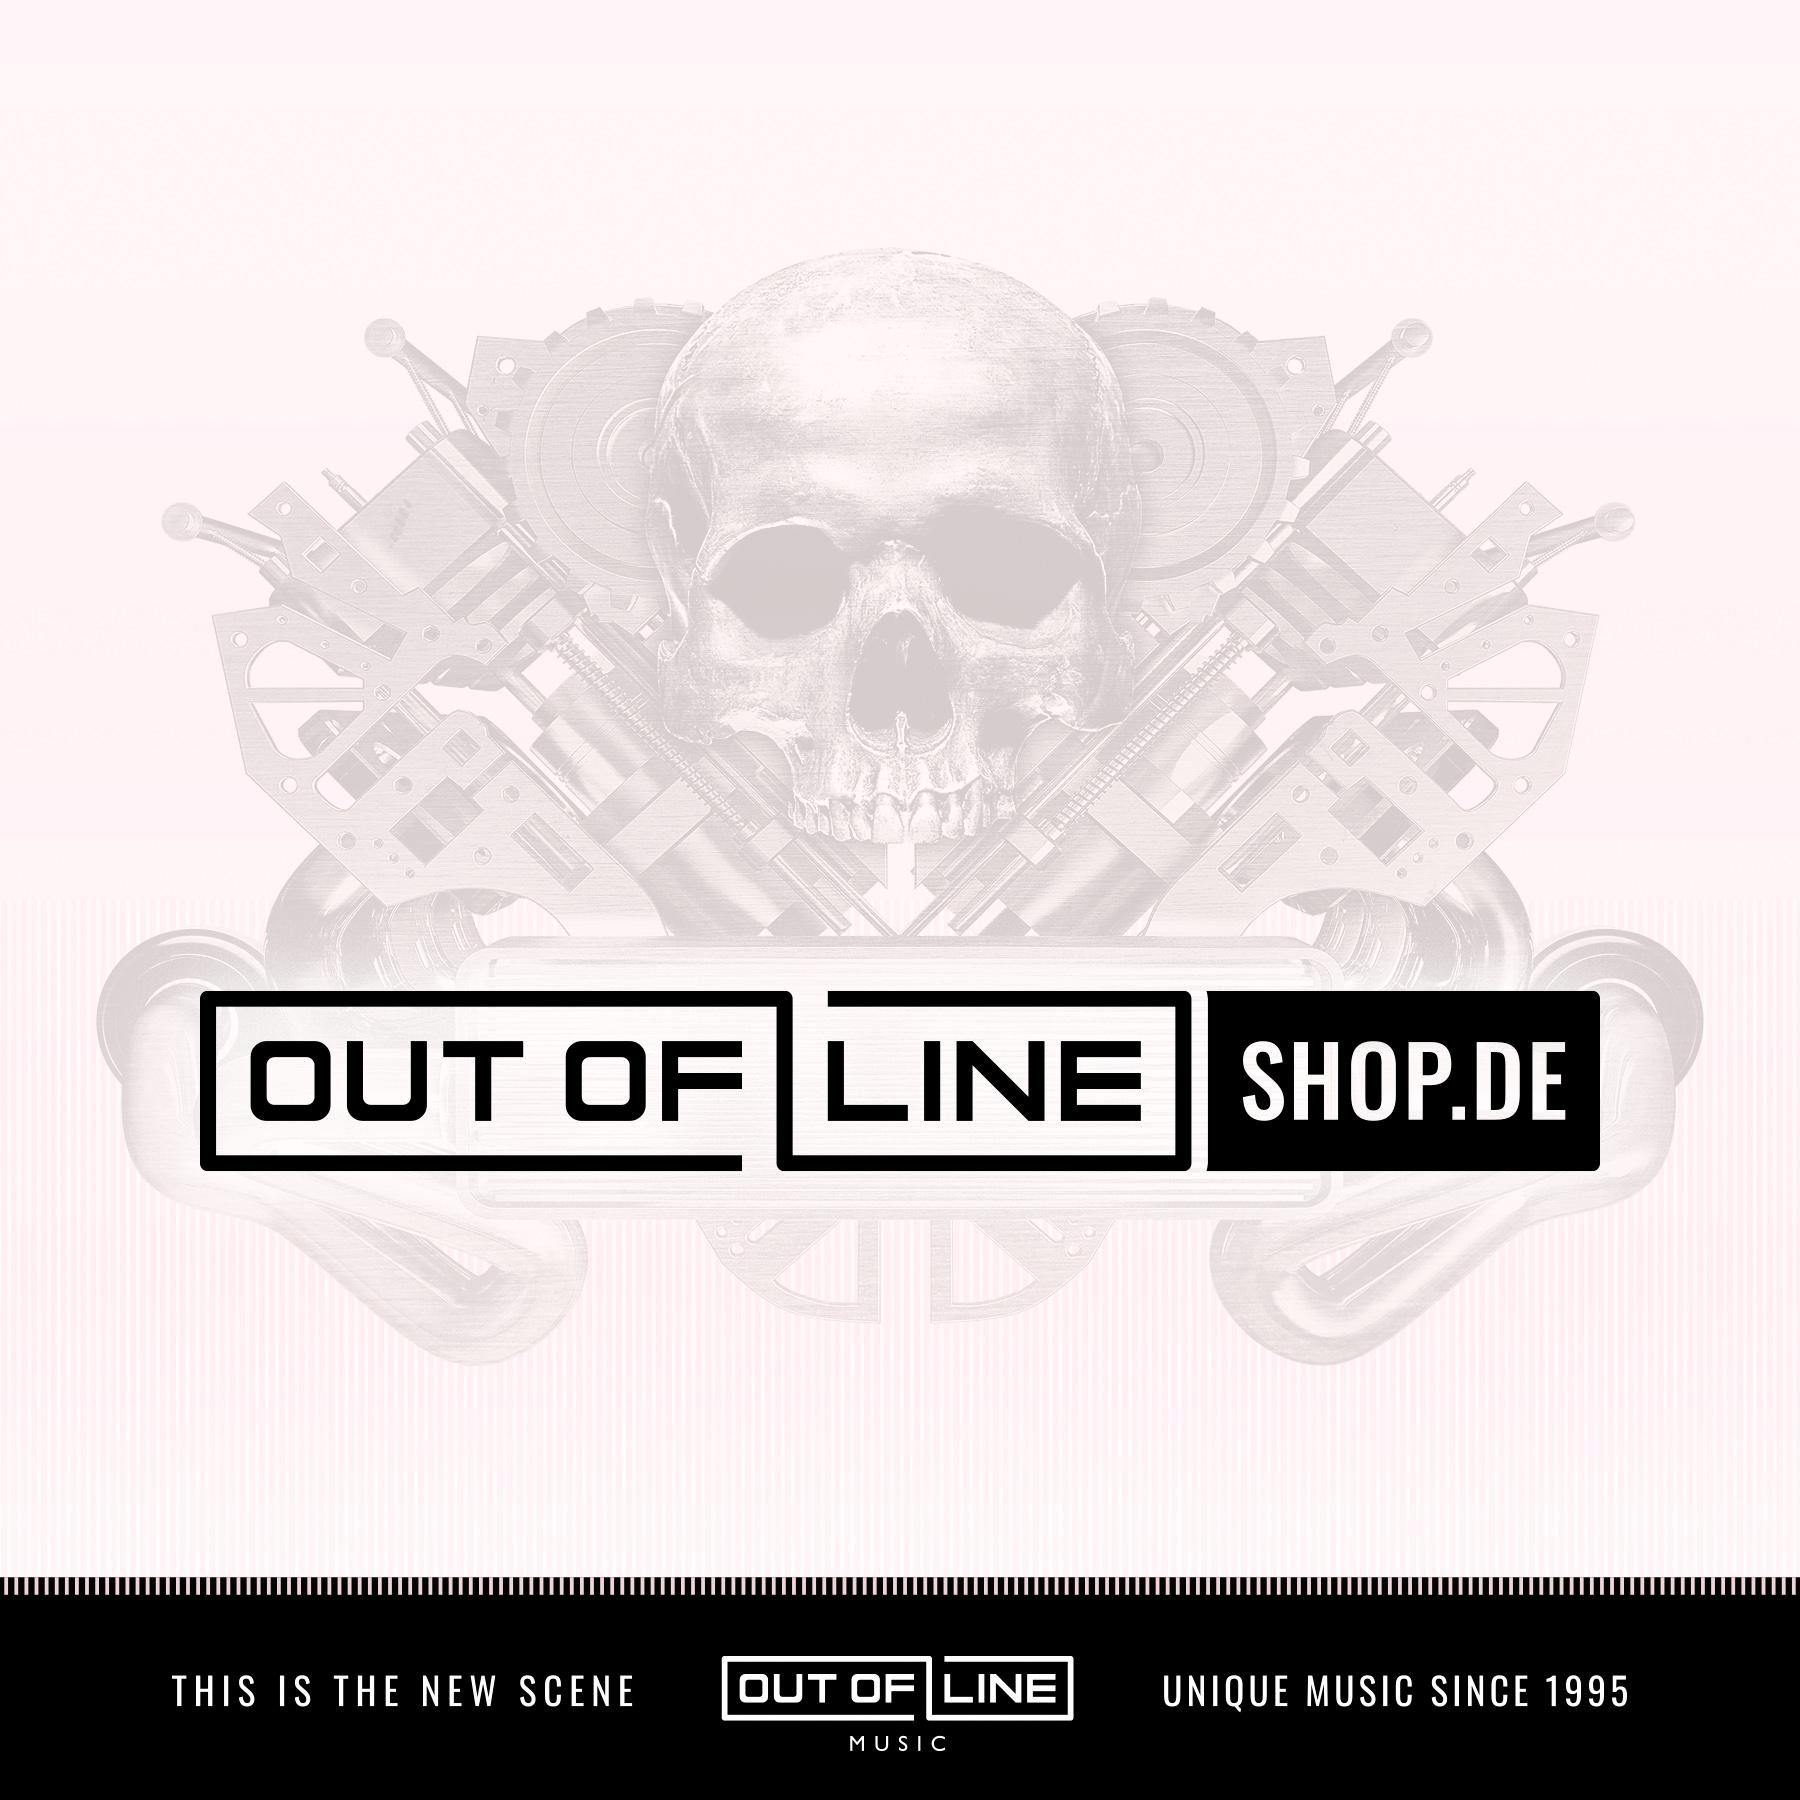 Cephalgy - Gott Maschine Vaterland - CD